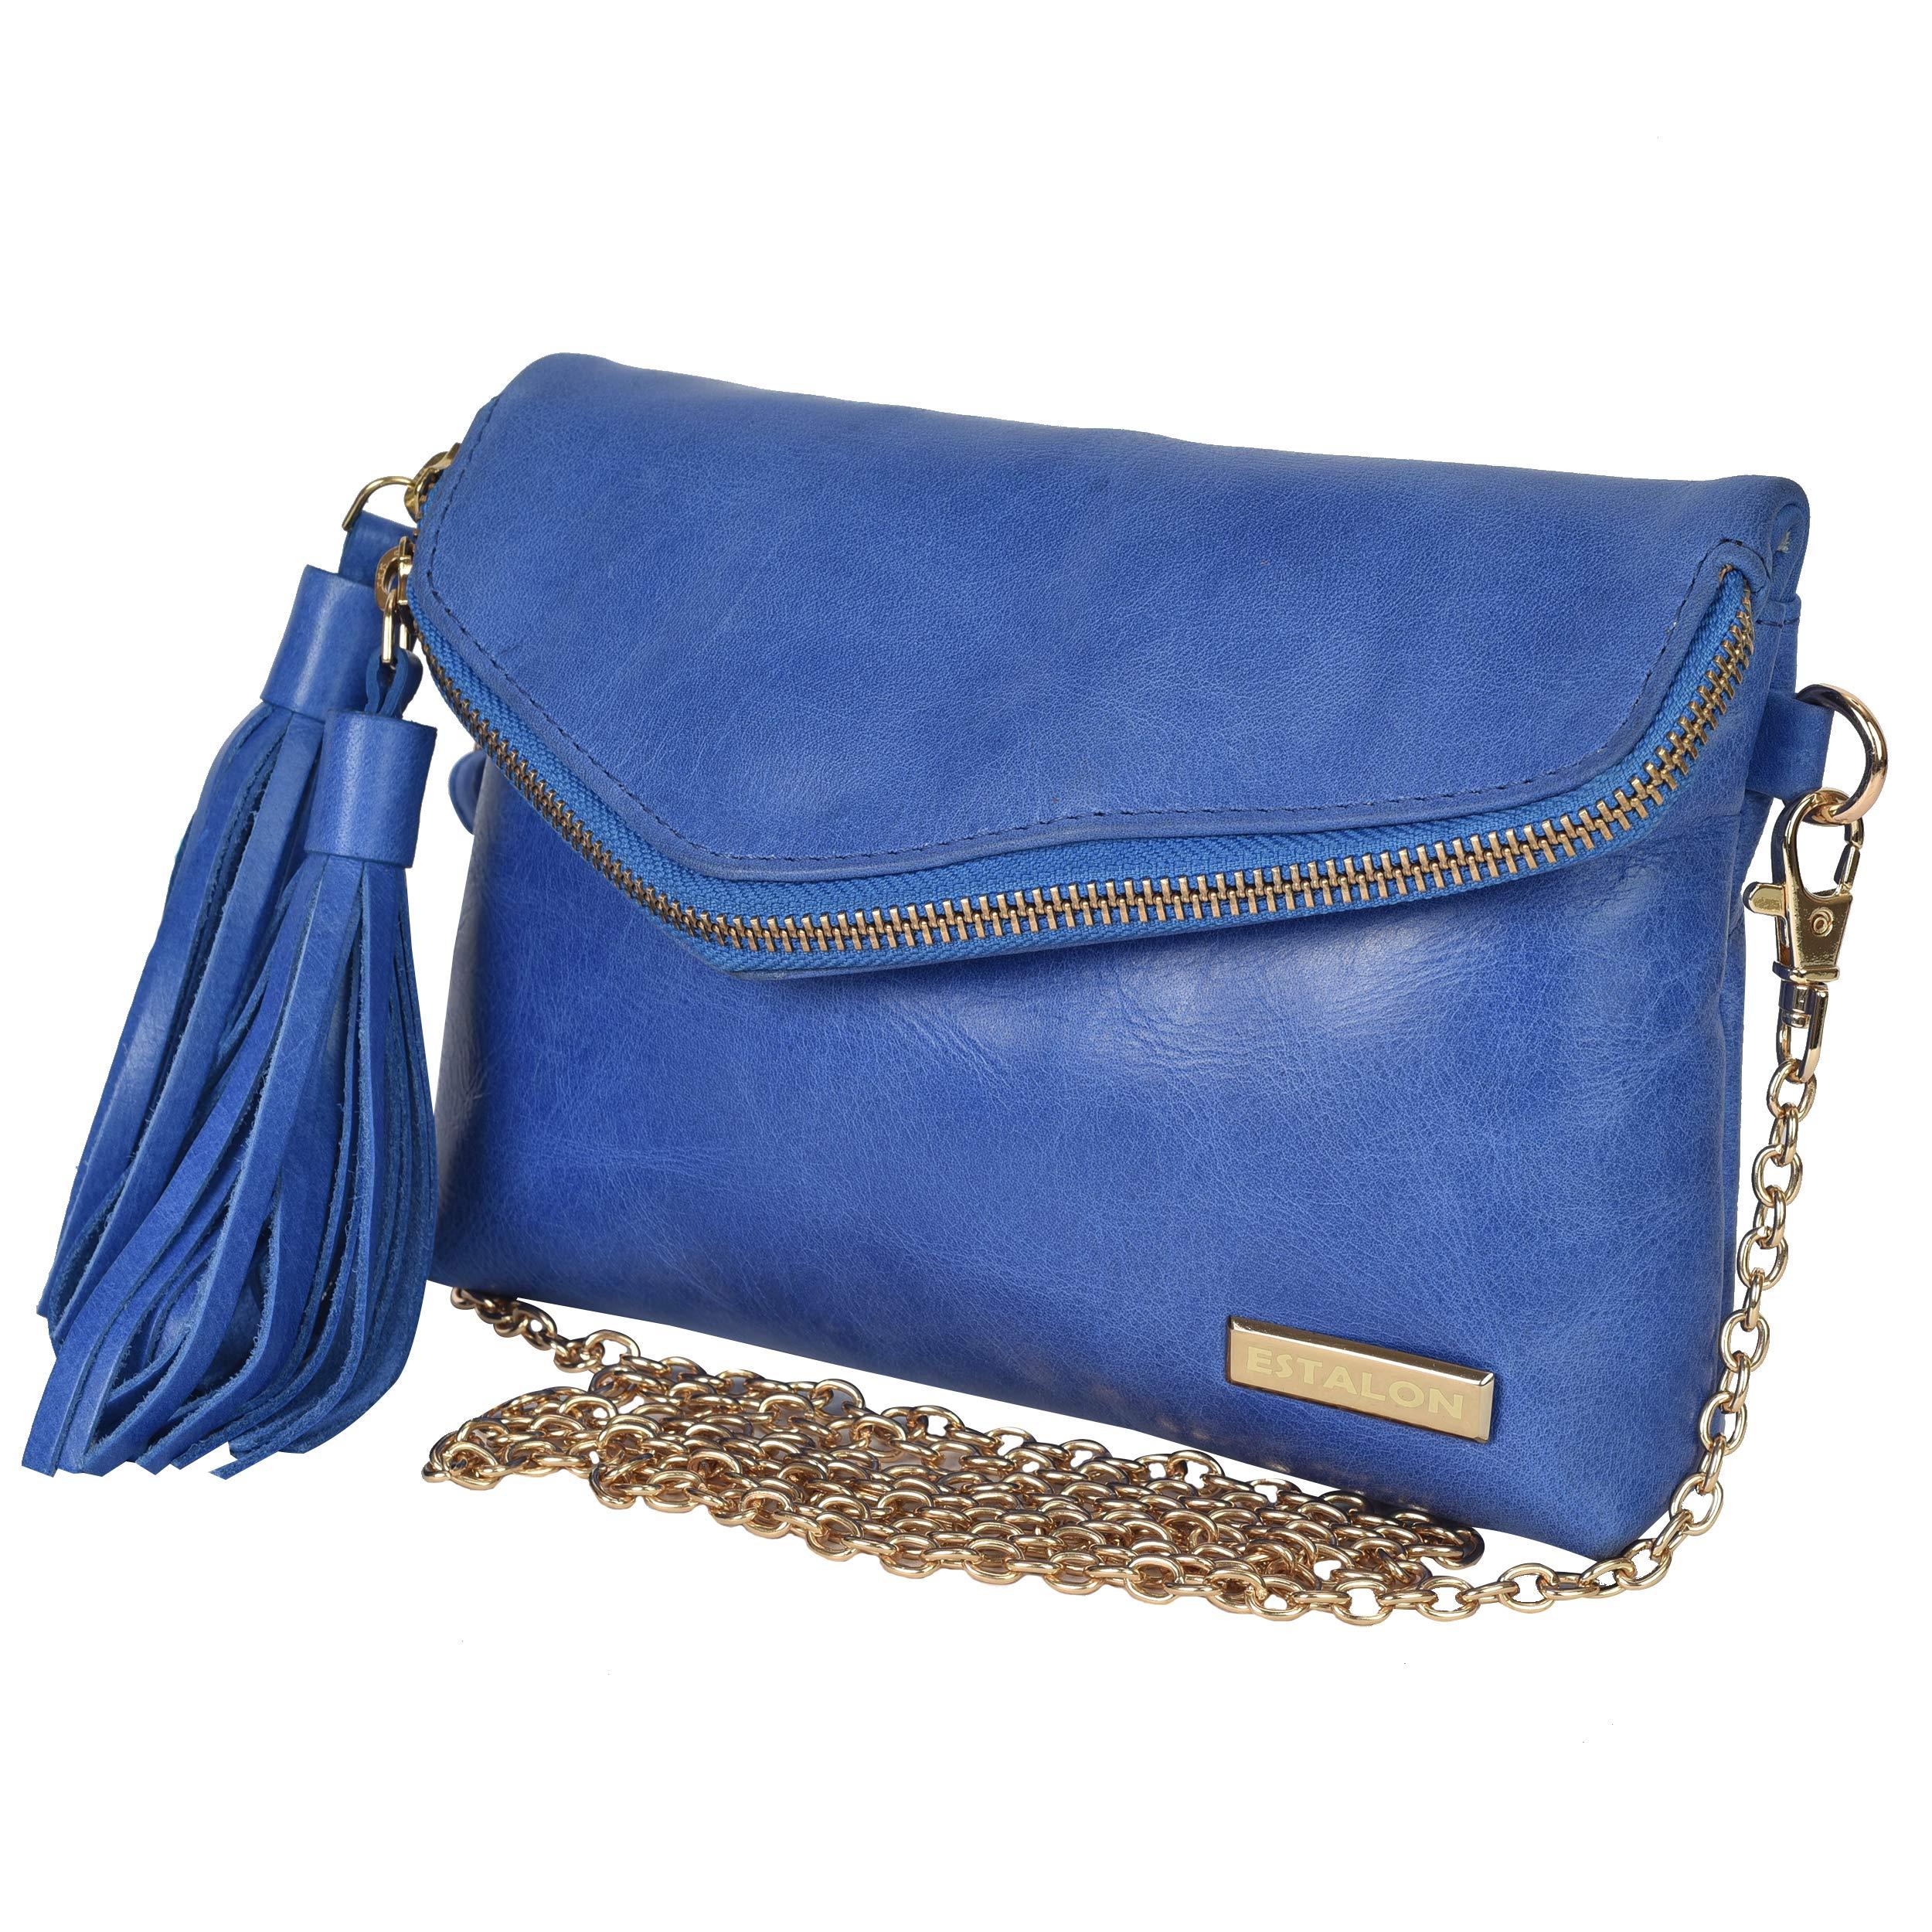 ec90be1b20d0 Leather Crossbody Bags for Women - Handmade Cross Body Bag Over the Shoulder  Purses Womens Handbag by Estalon (Blue Nappa)